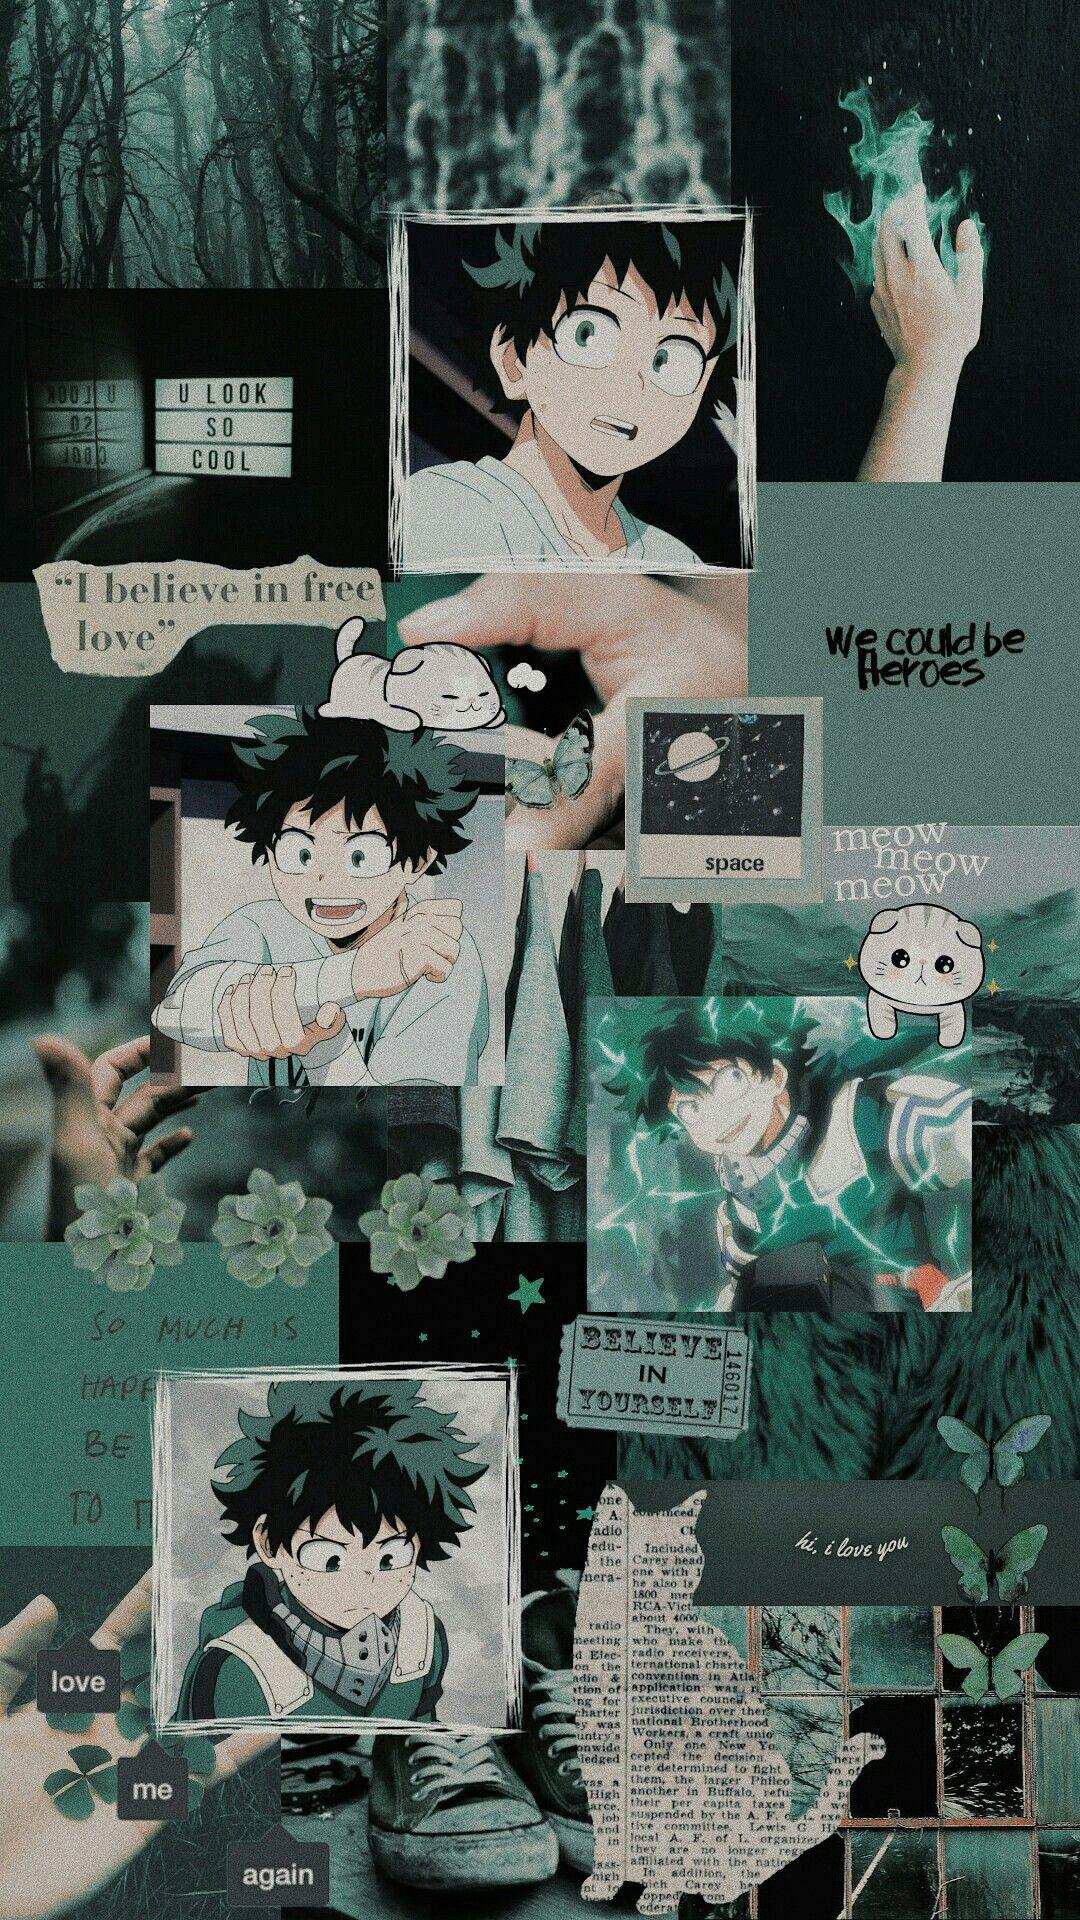 Izuku Midoriya Hero wallpaper, Cute anime wallpaper